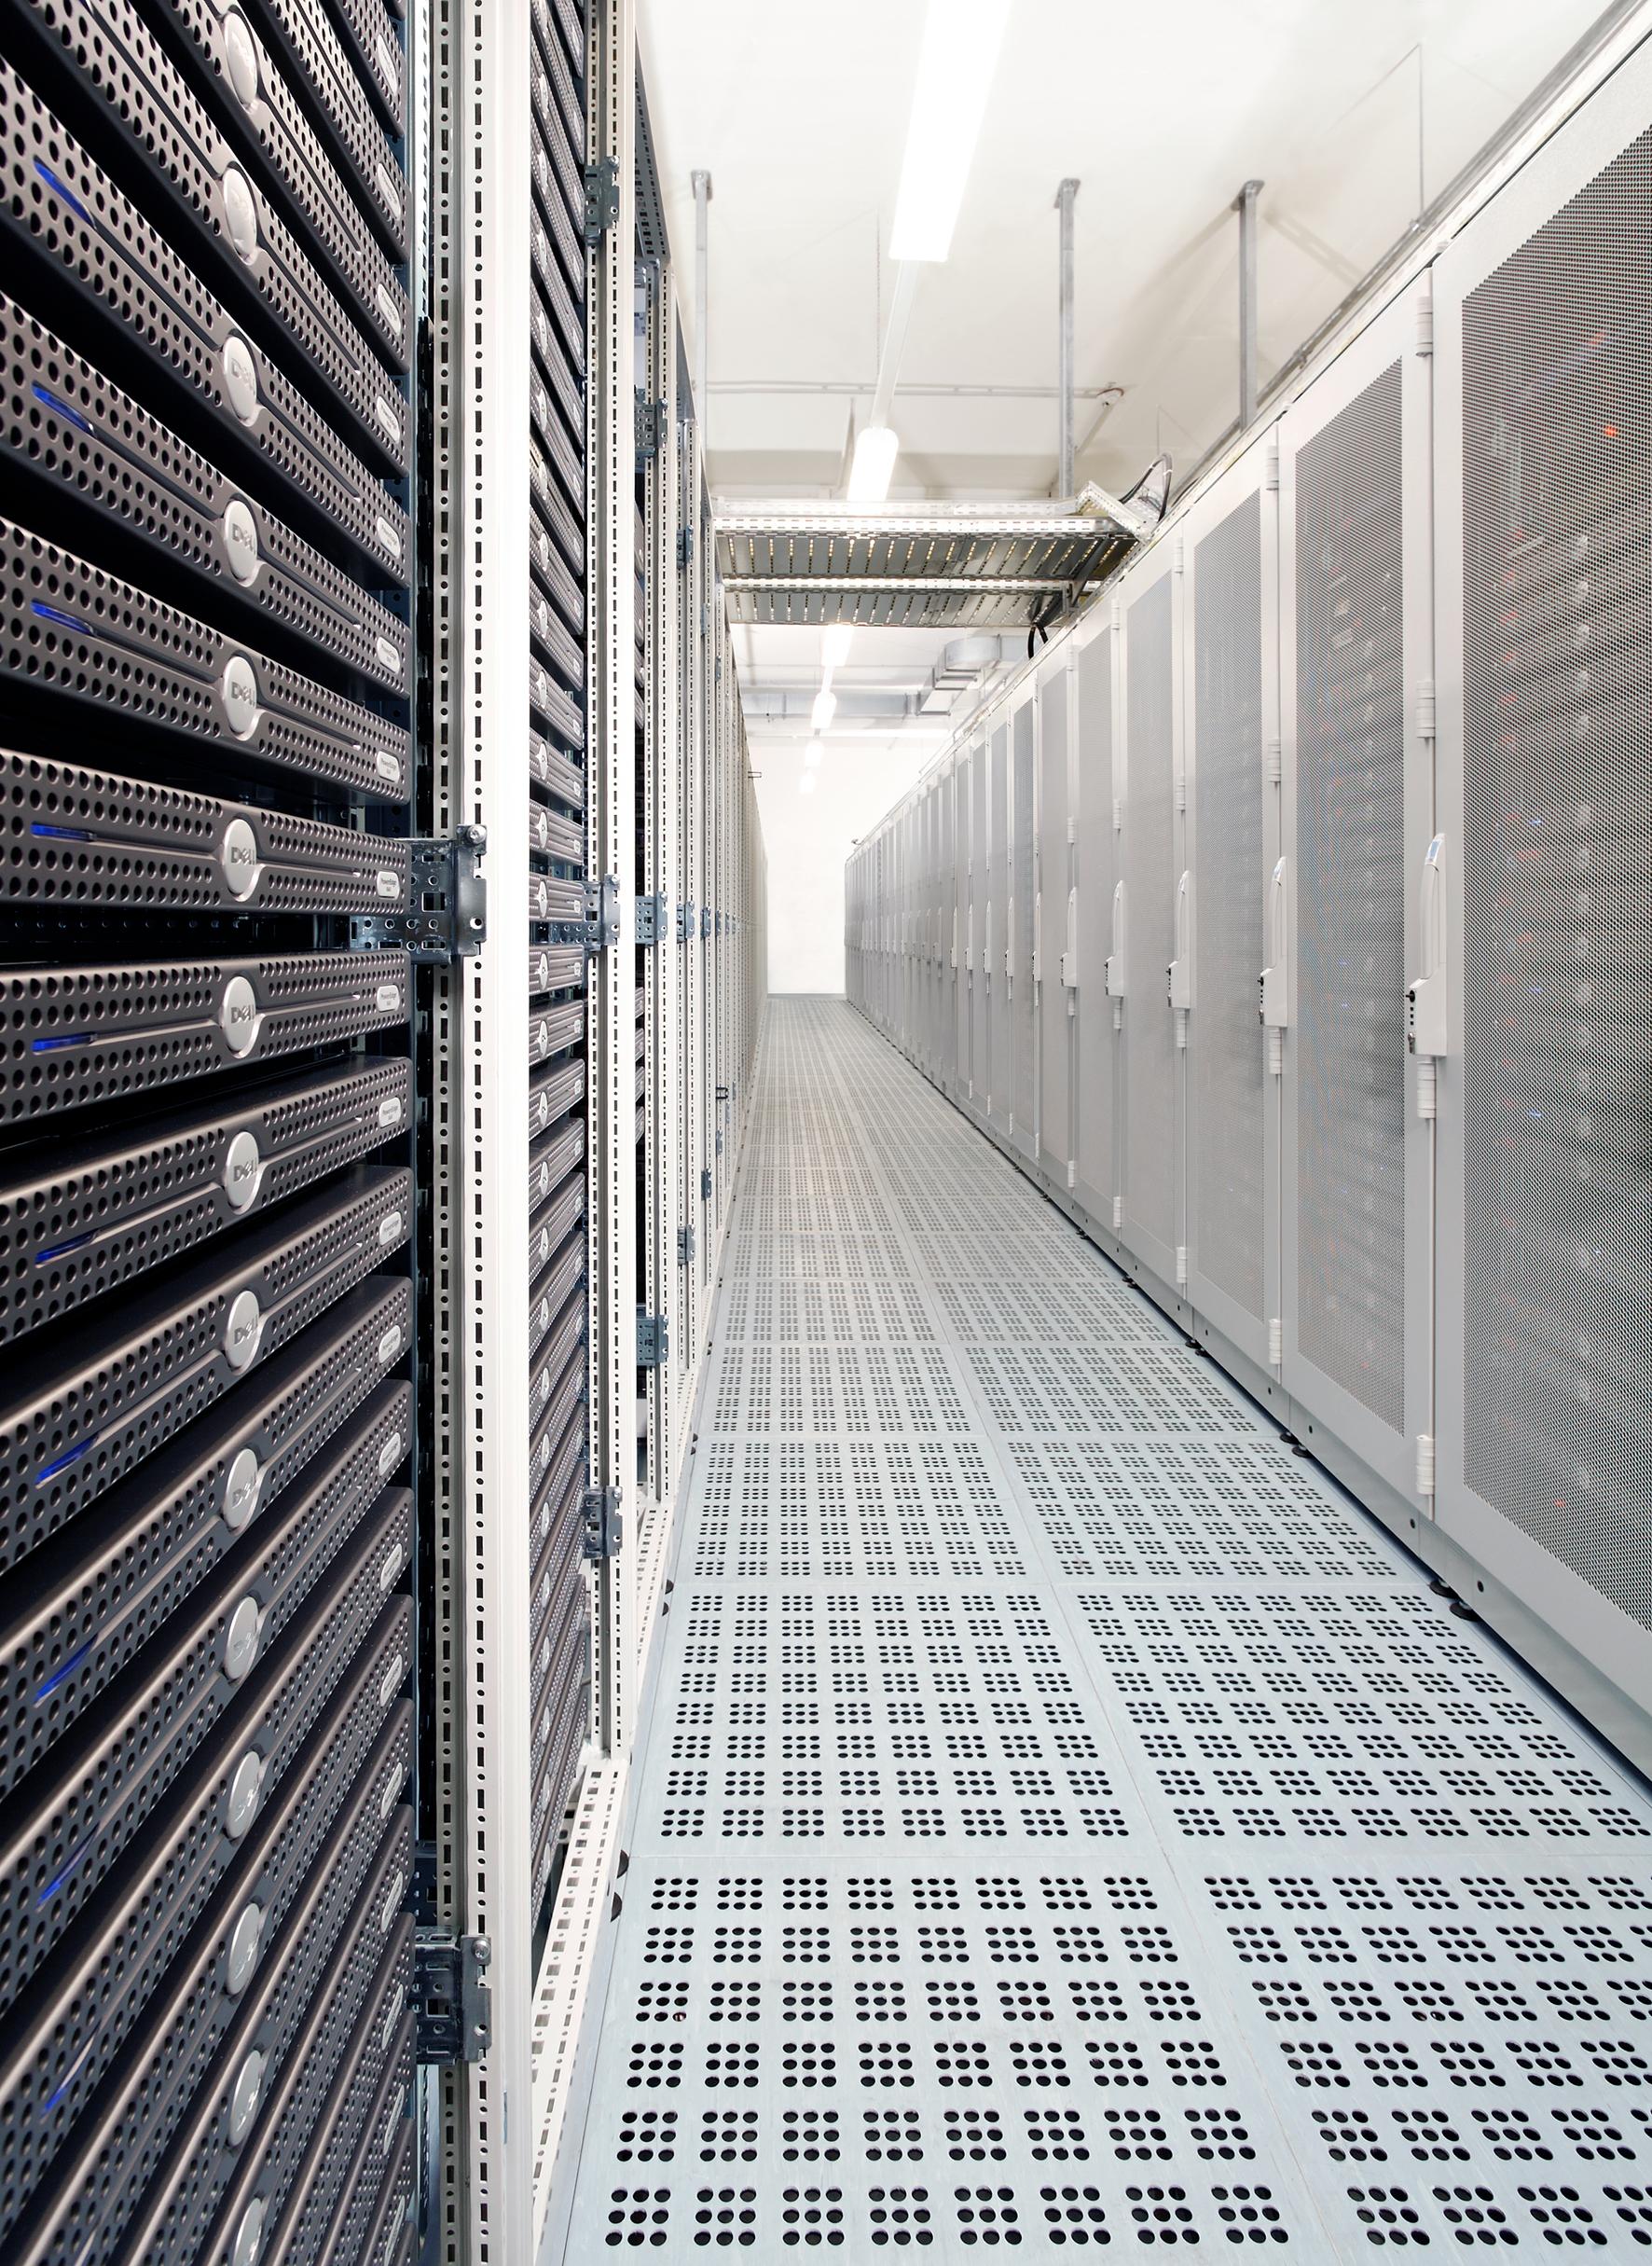 Servergang im Hosteurope Datacenter I